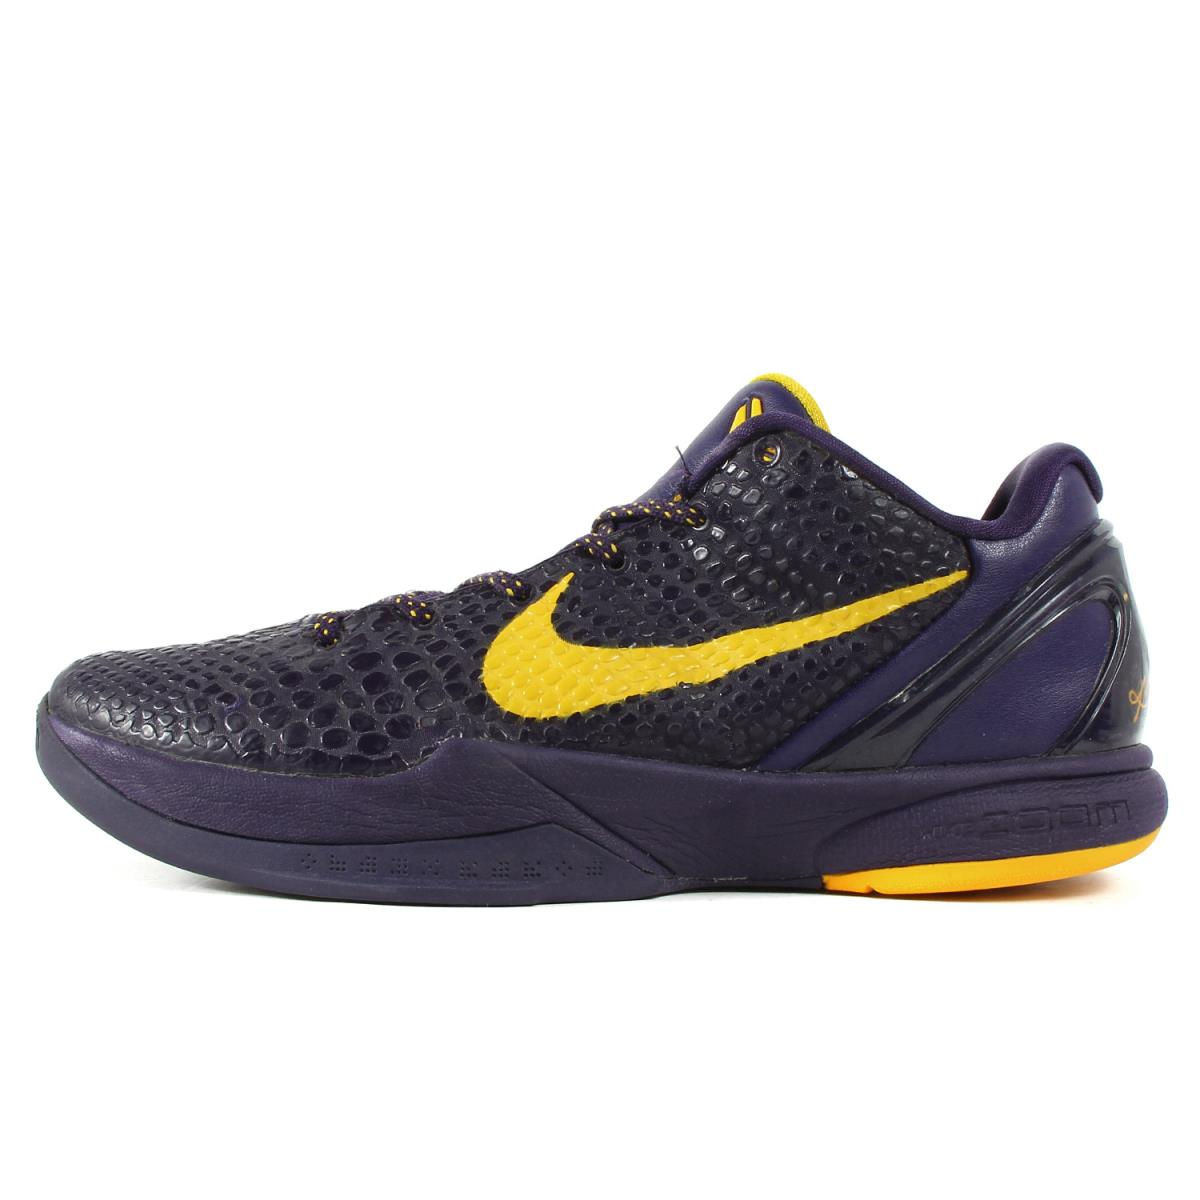 watch bbe1d 5343f NIKE (Nike) ZOOM KOBE 6 Lakers (429,659-501) Imperial purple US10 ...